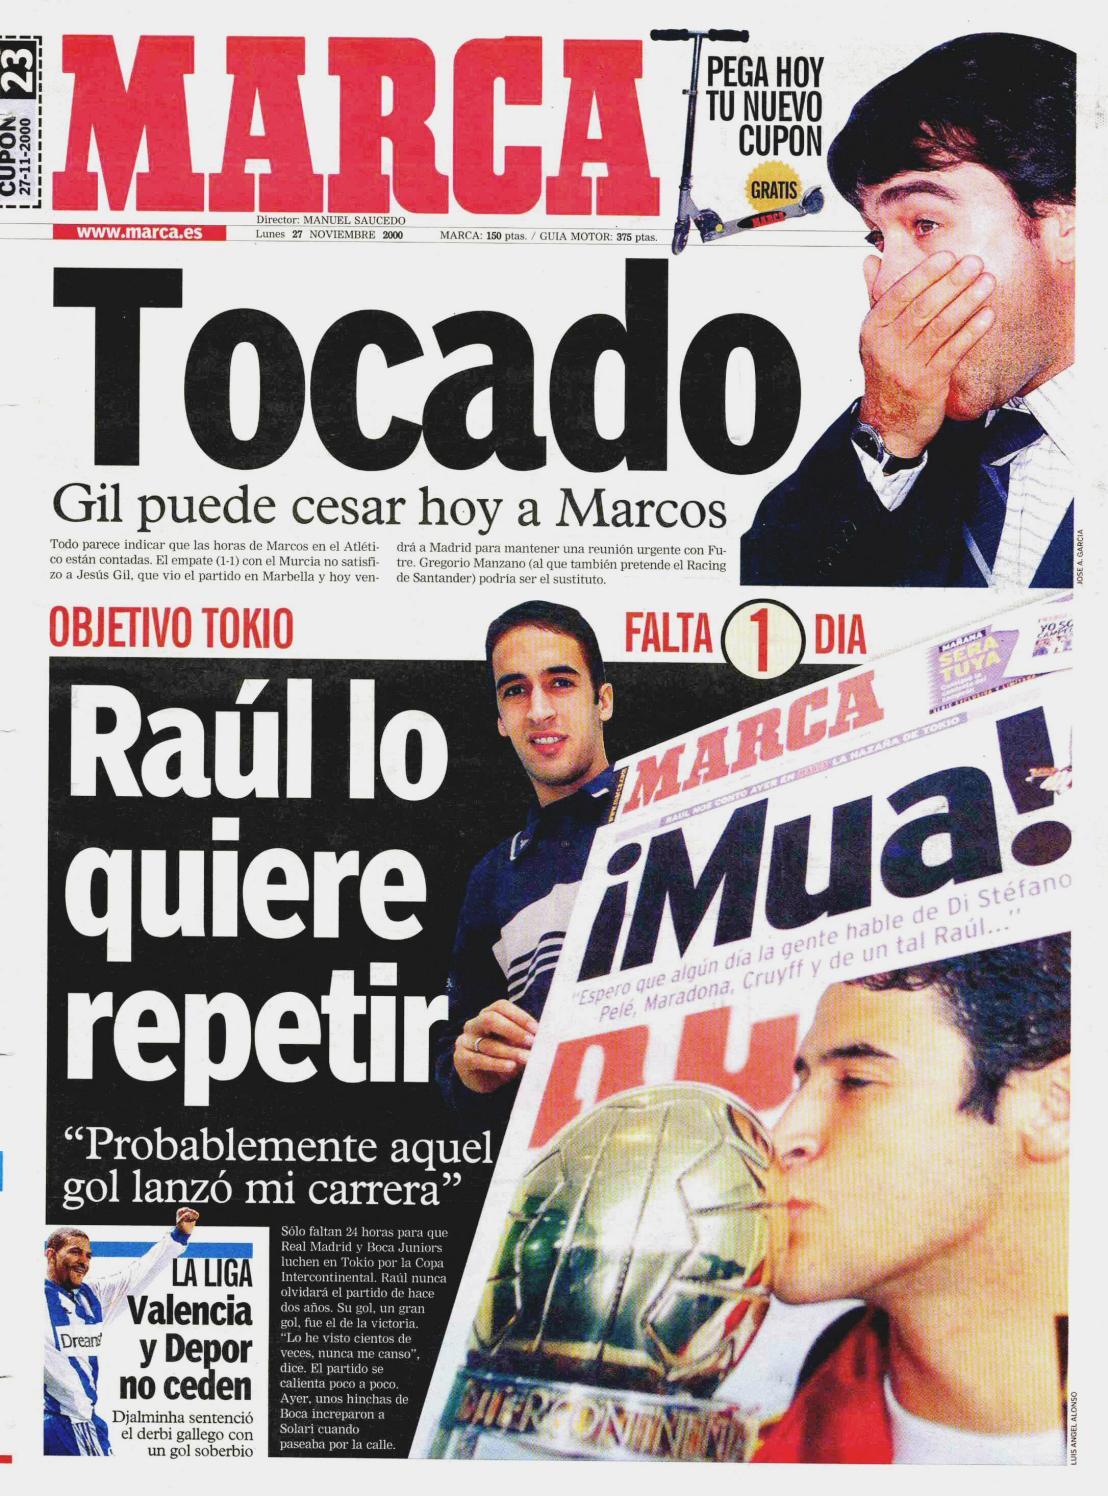 Marca 20001127 by Juan Carlos Matos Costa - issuu